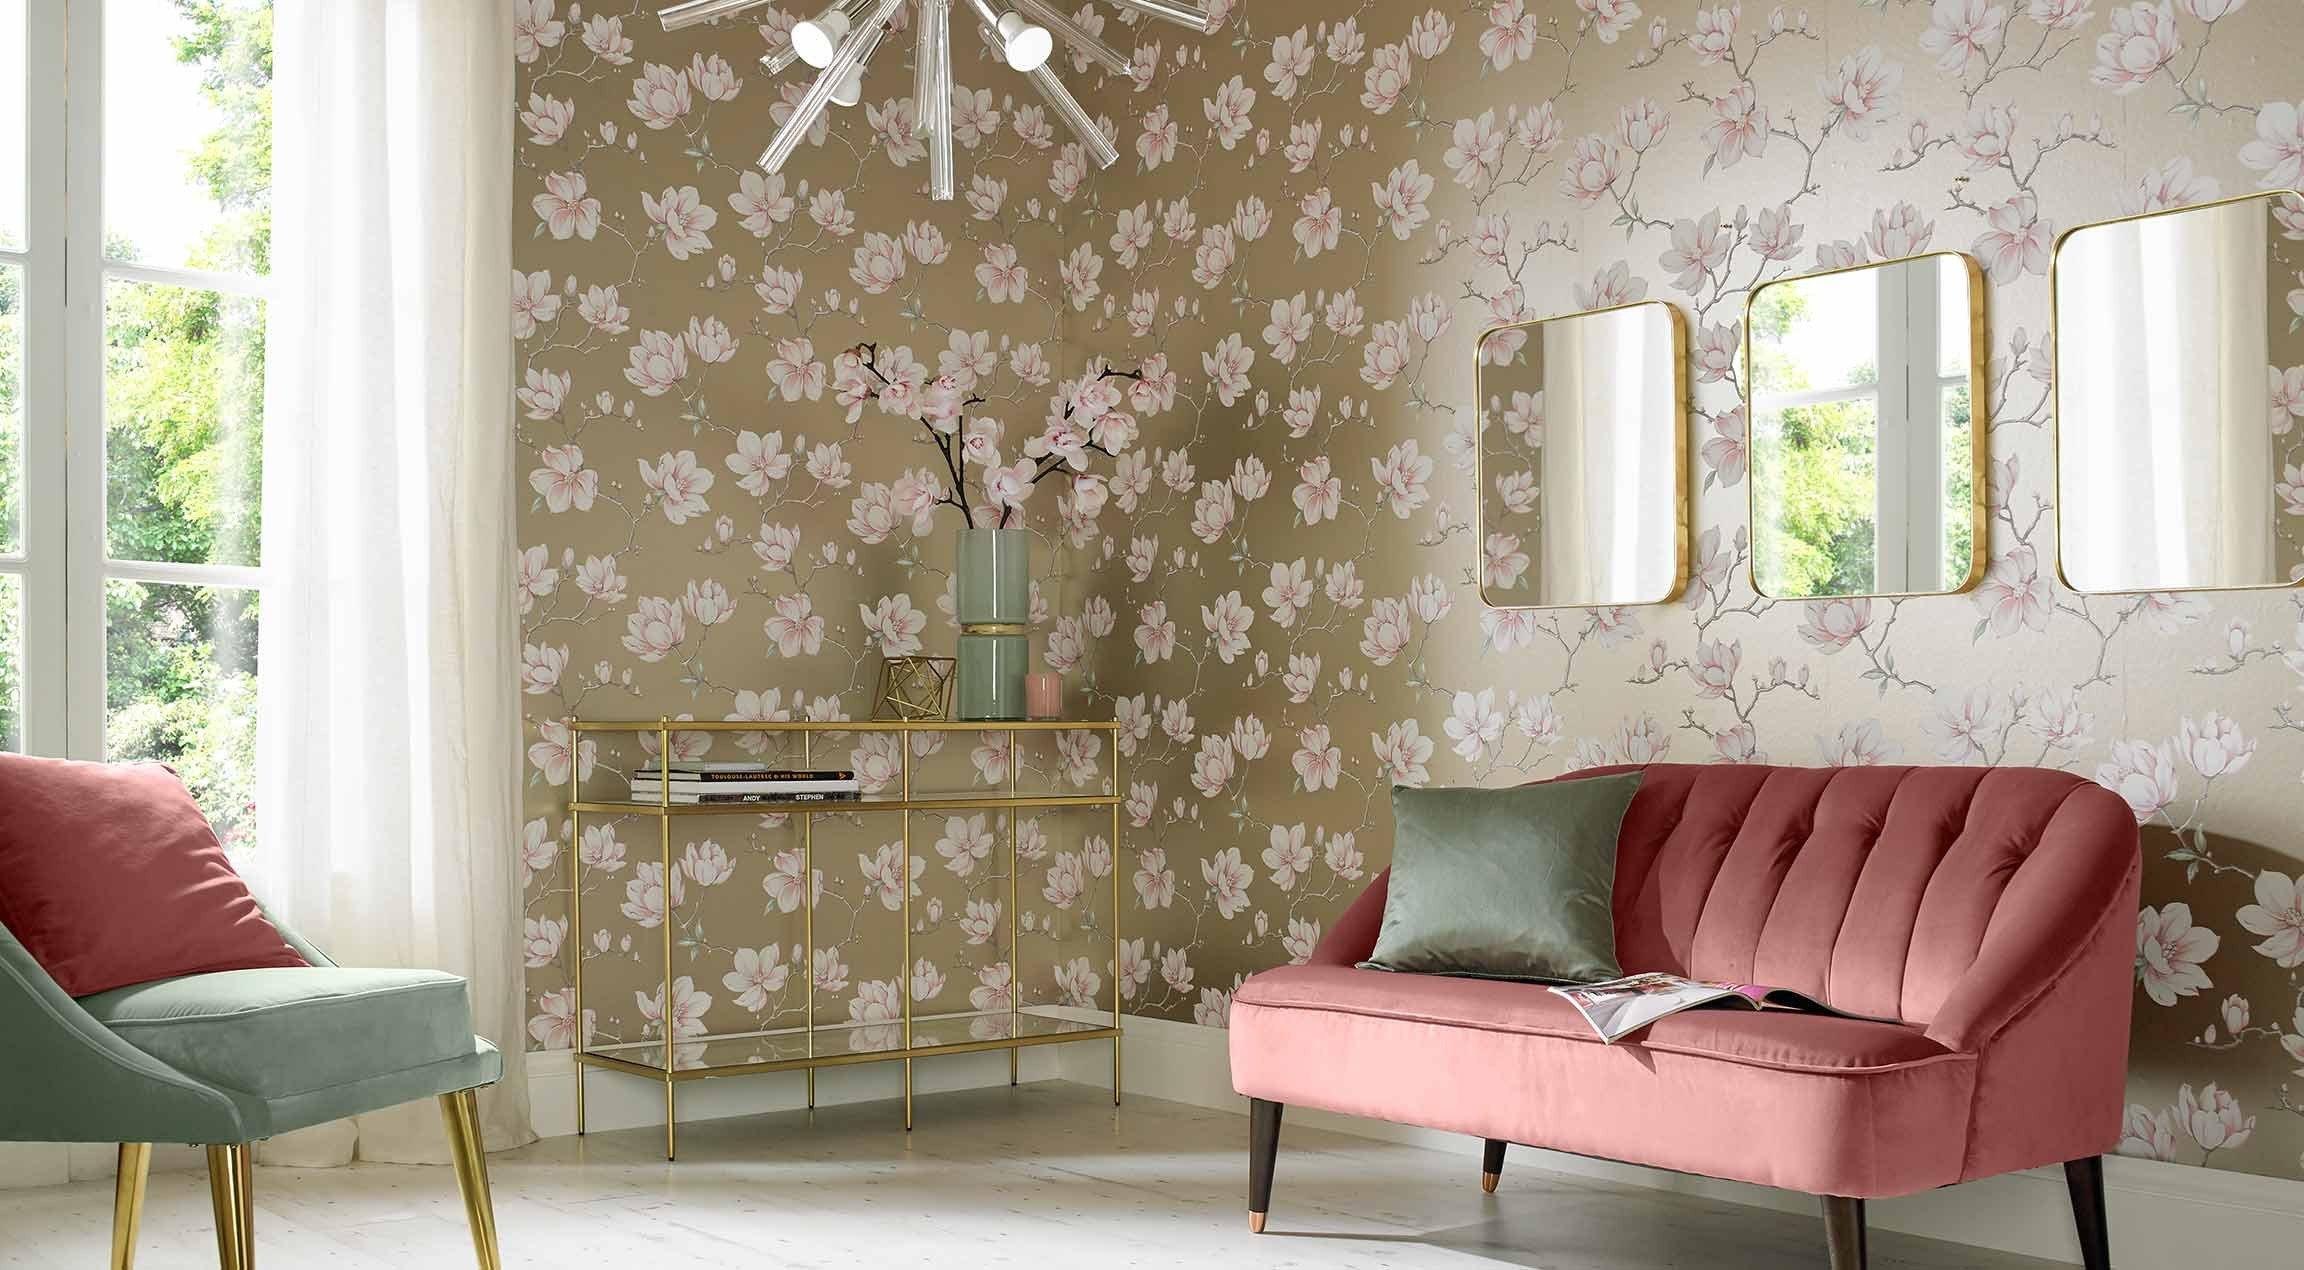 Wallpaper for Living Room Ideas Lovely Wallpaper for Walls Wall Coverings